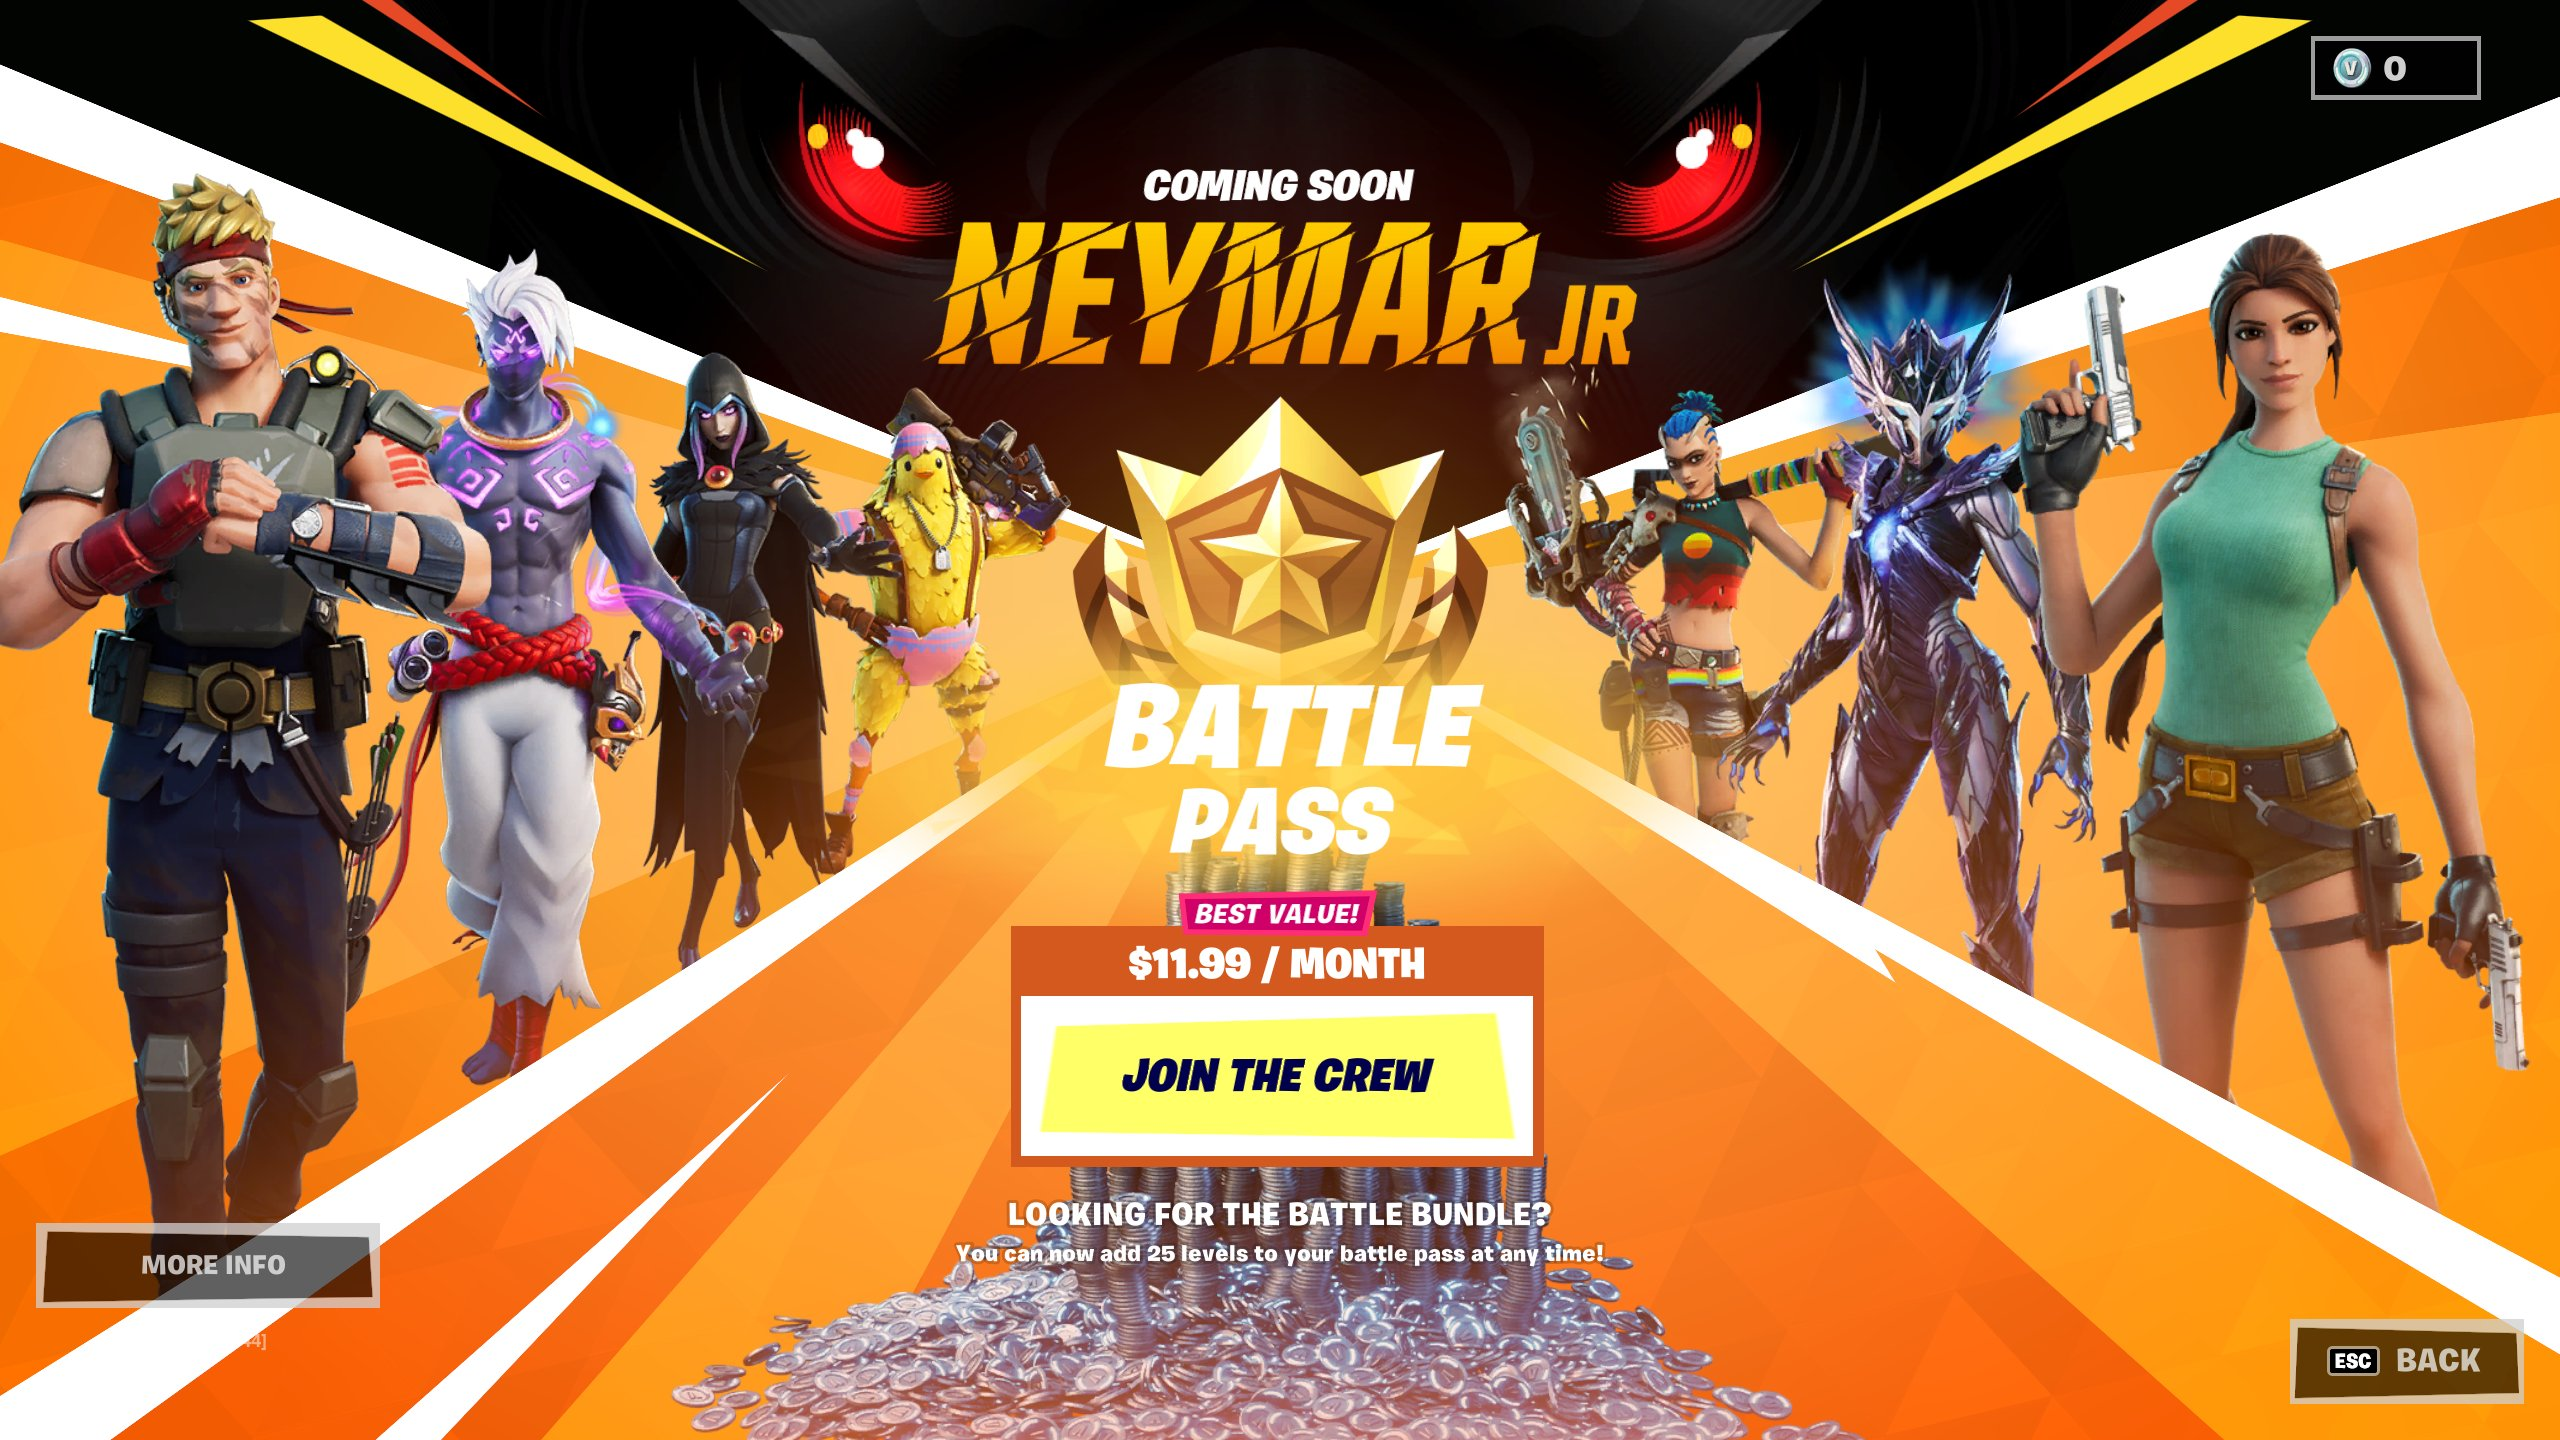 The Fortnite Battle Pass screen showing Neymar Jr.